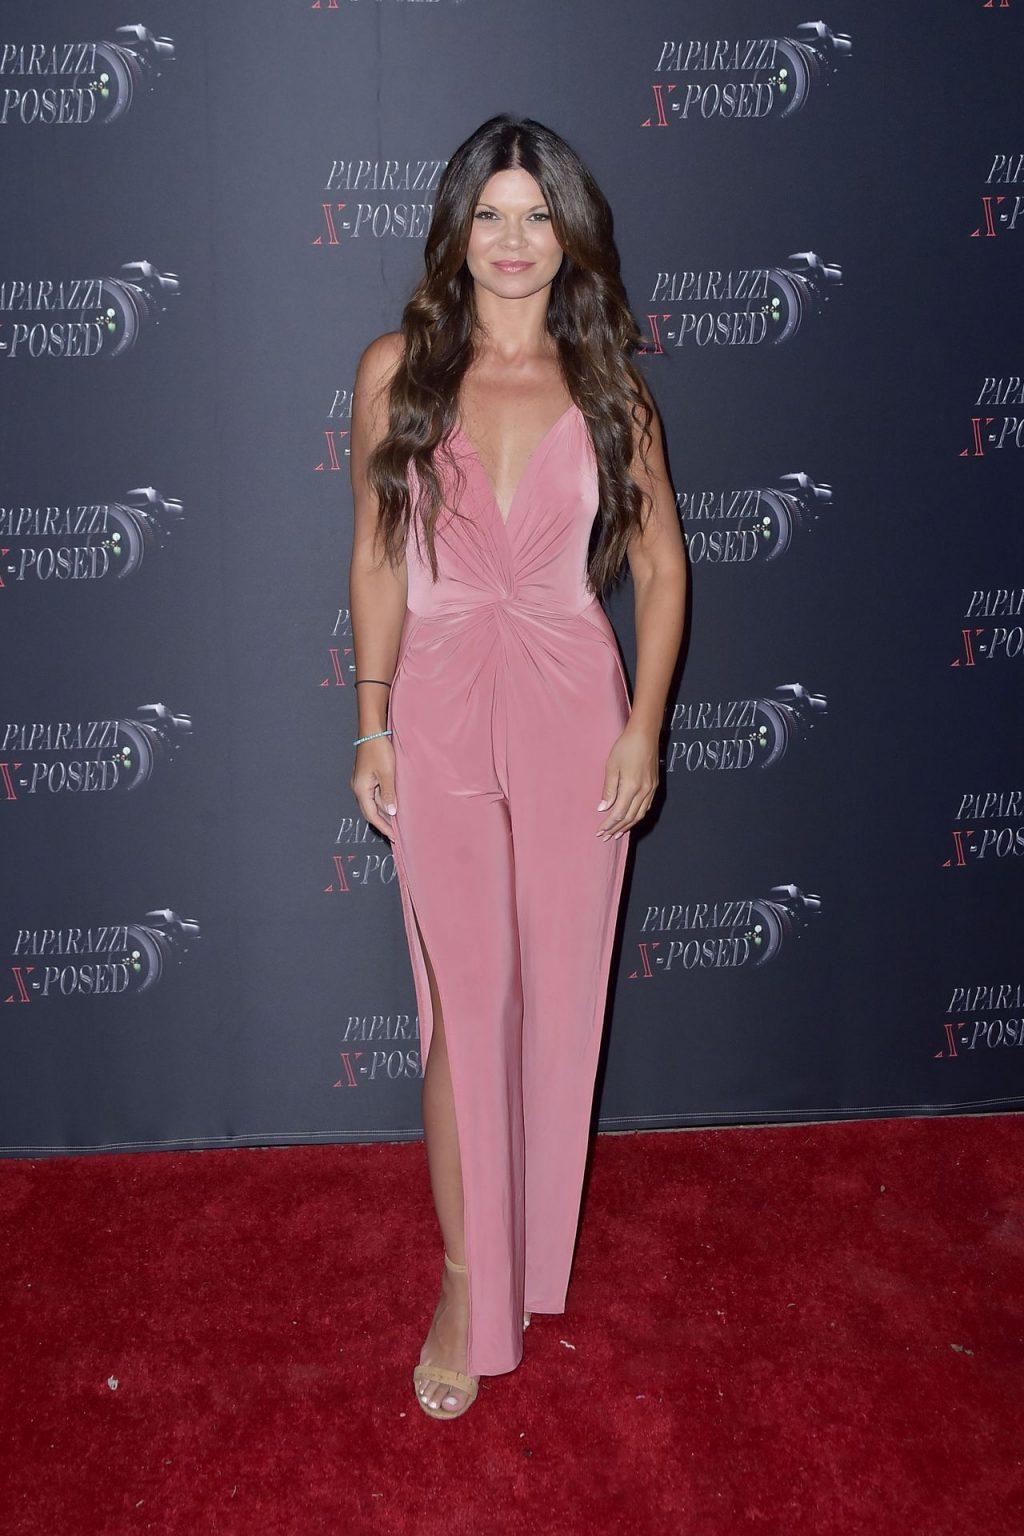 Danielle Vasinova Stuns at the Premiere of Paparazzi X-Posed (Photos)